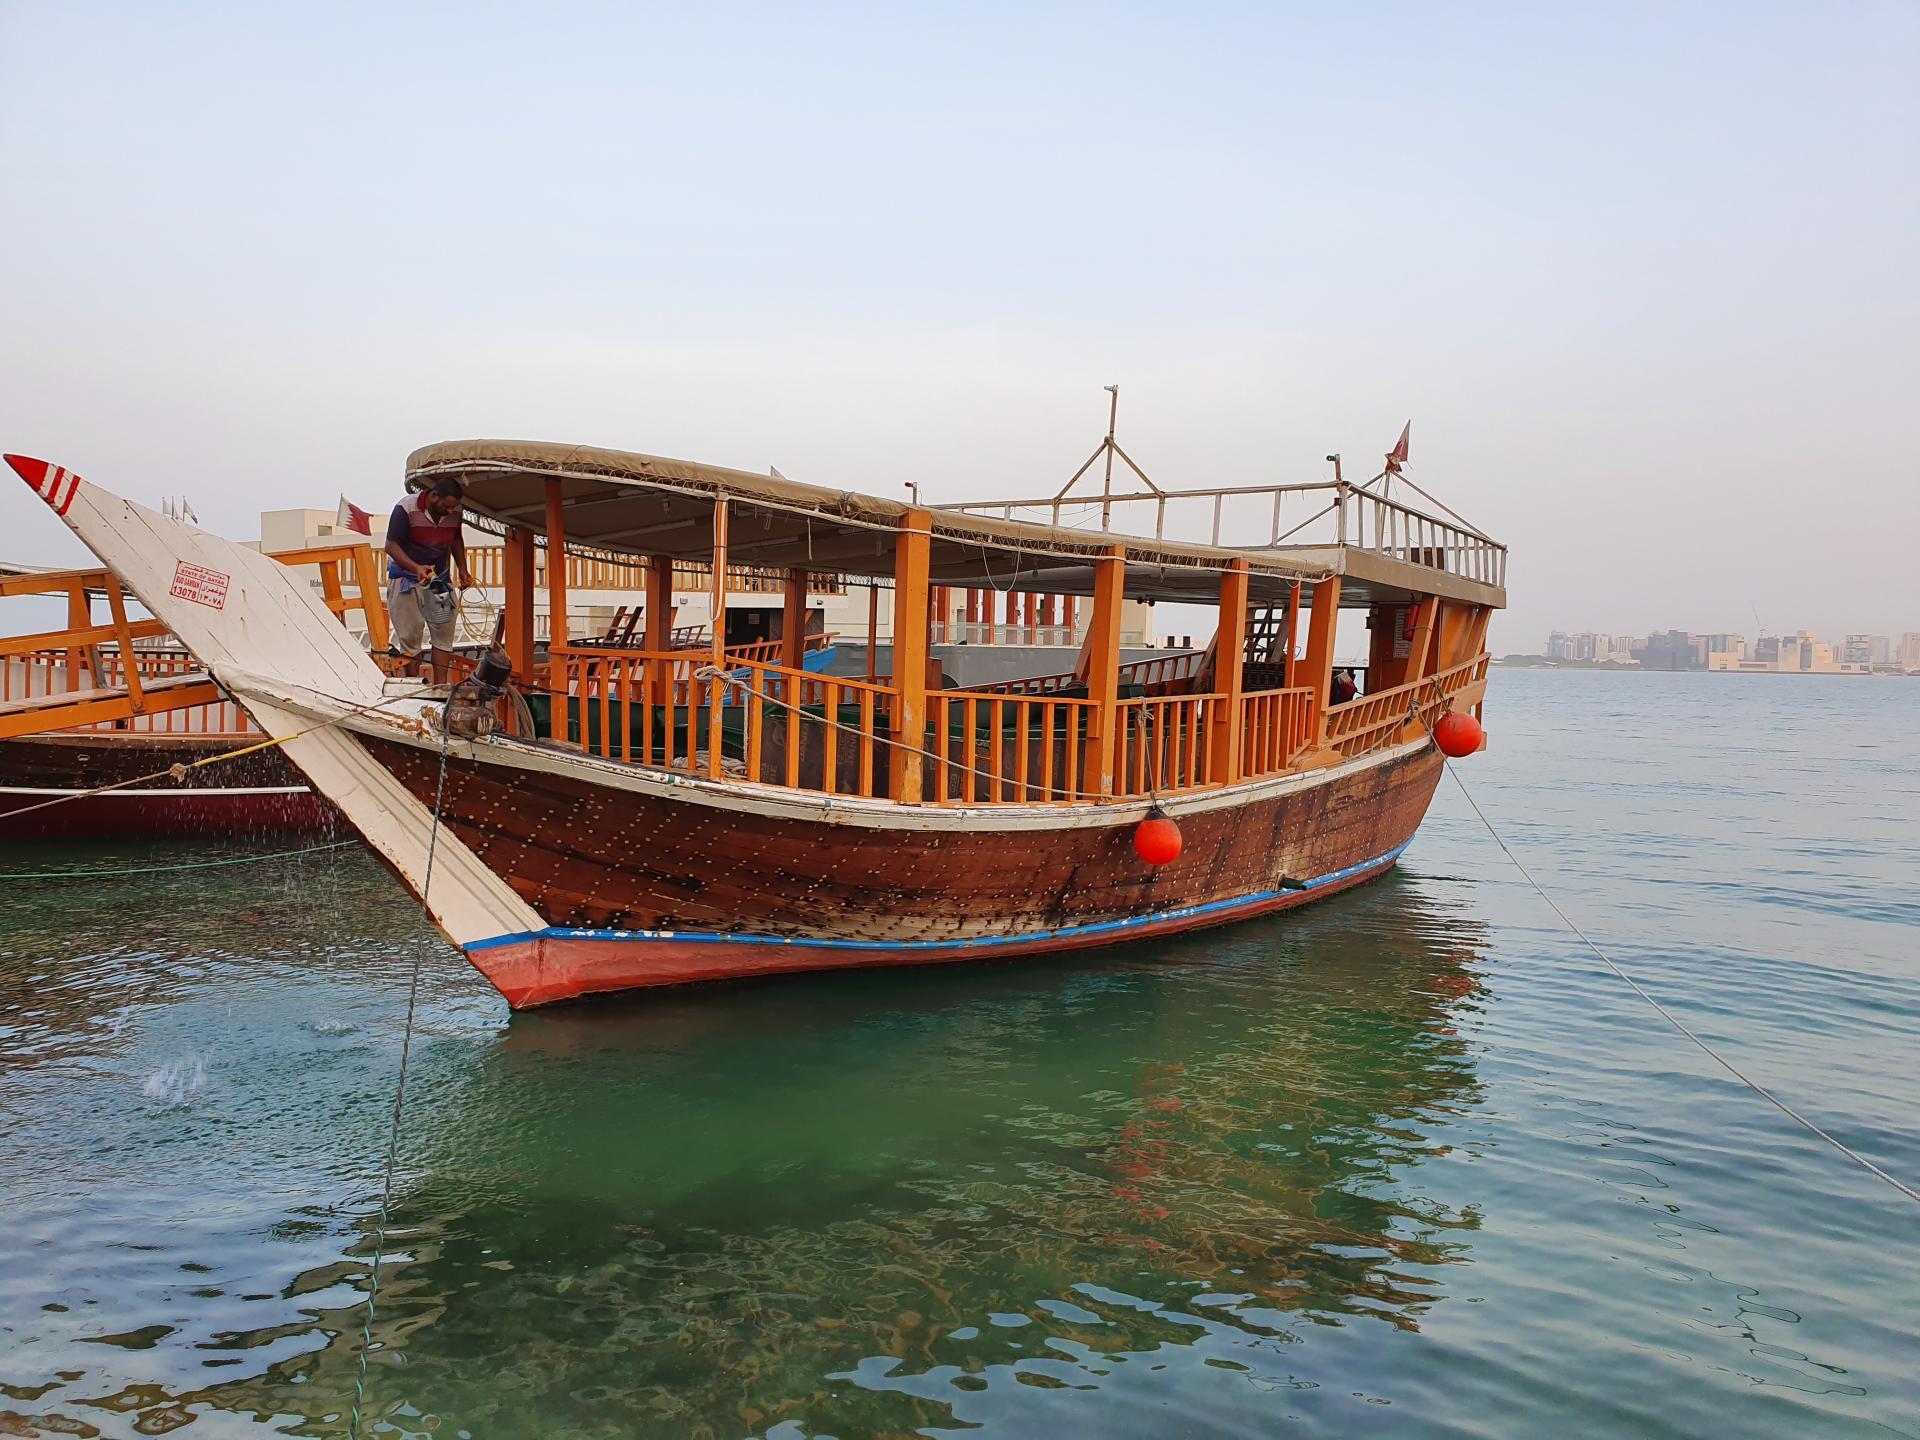 прогулочная лодка на берегу Персидского залива в Дохе